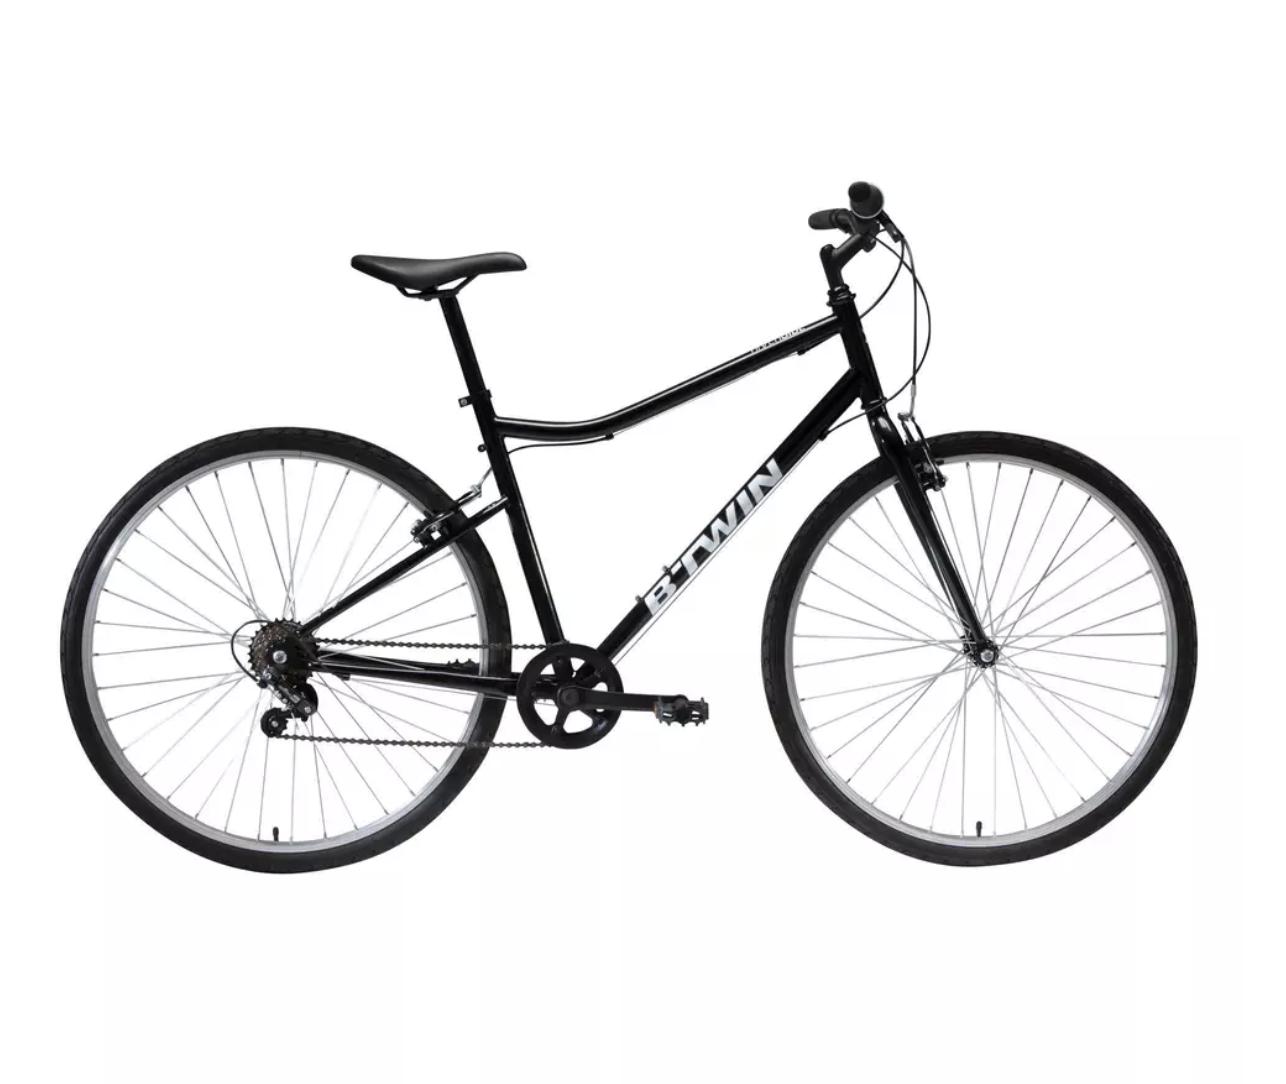 halford hybrid bikes